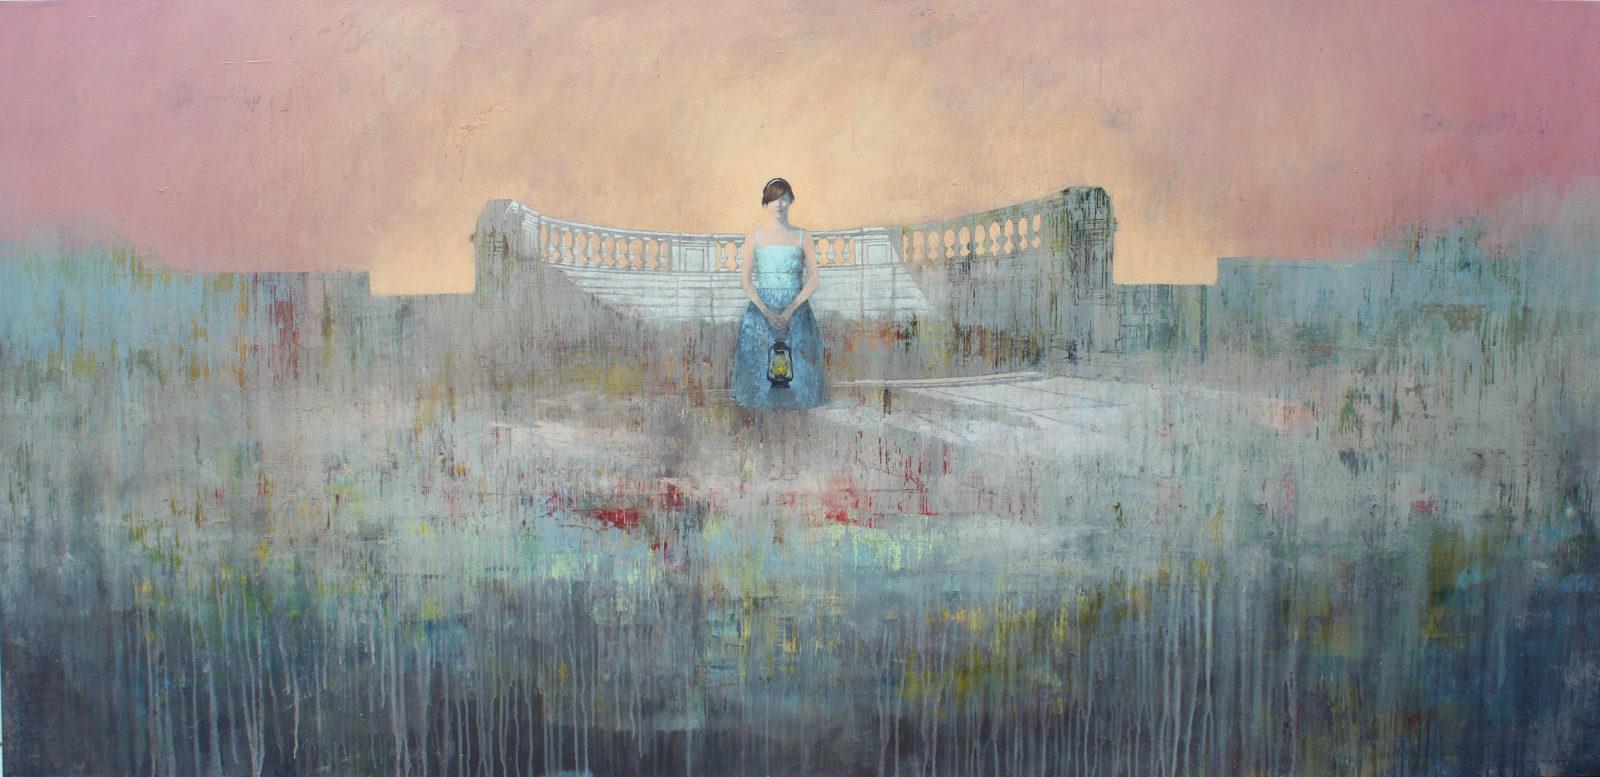 INFANTE FEDERICO, The Last Light, 2014, AcrIlico su tela, 121x254 cm